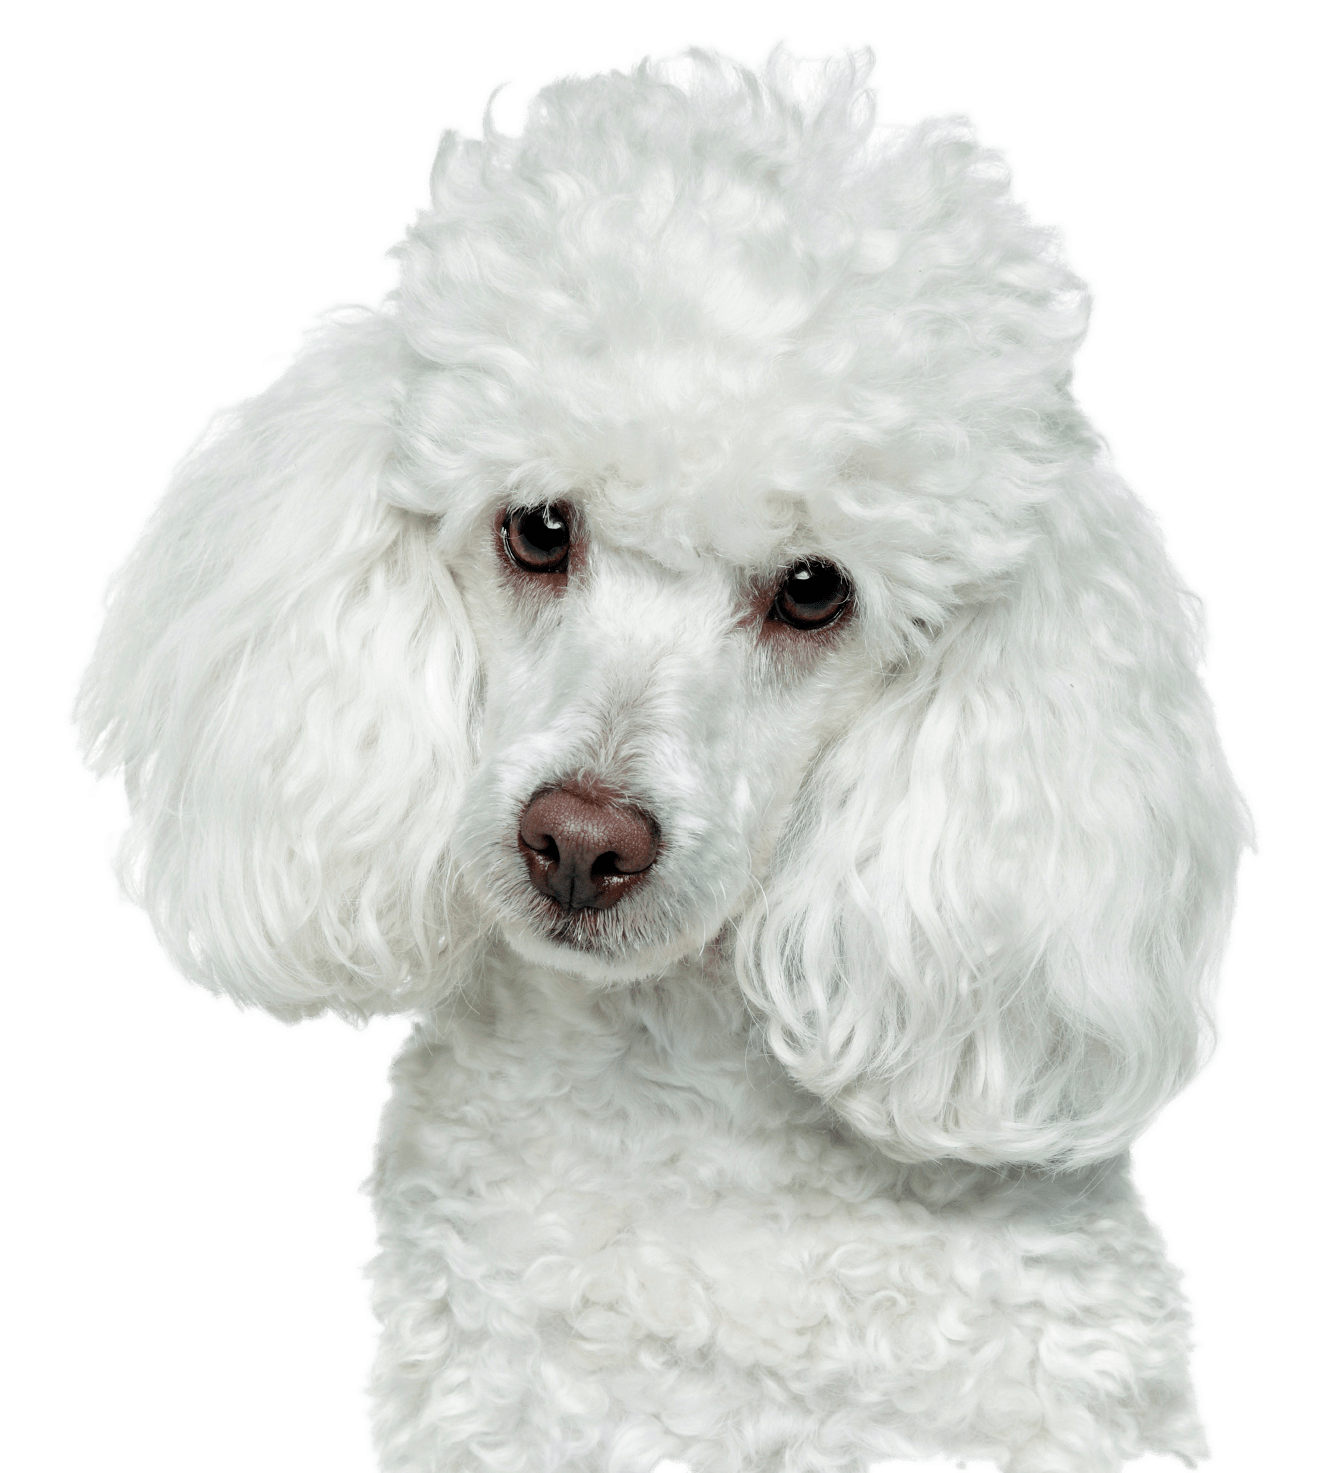 White Poodle Head Transparent Png Stickpng